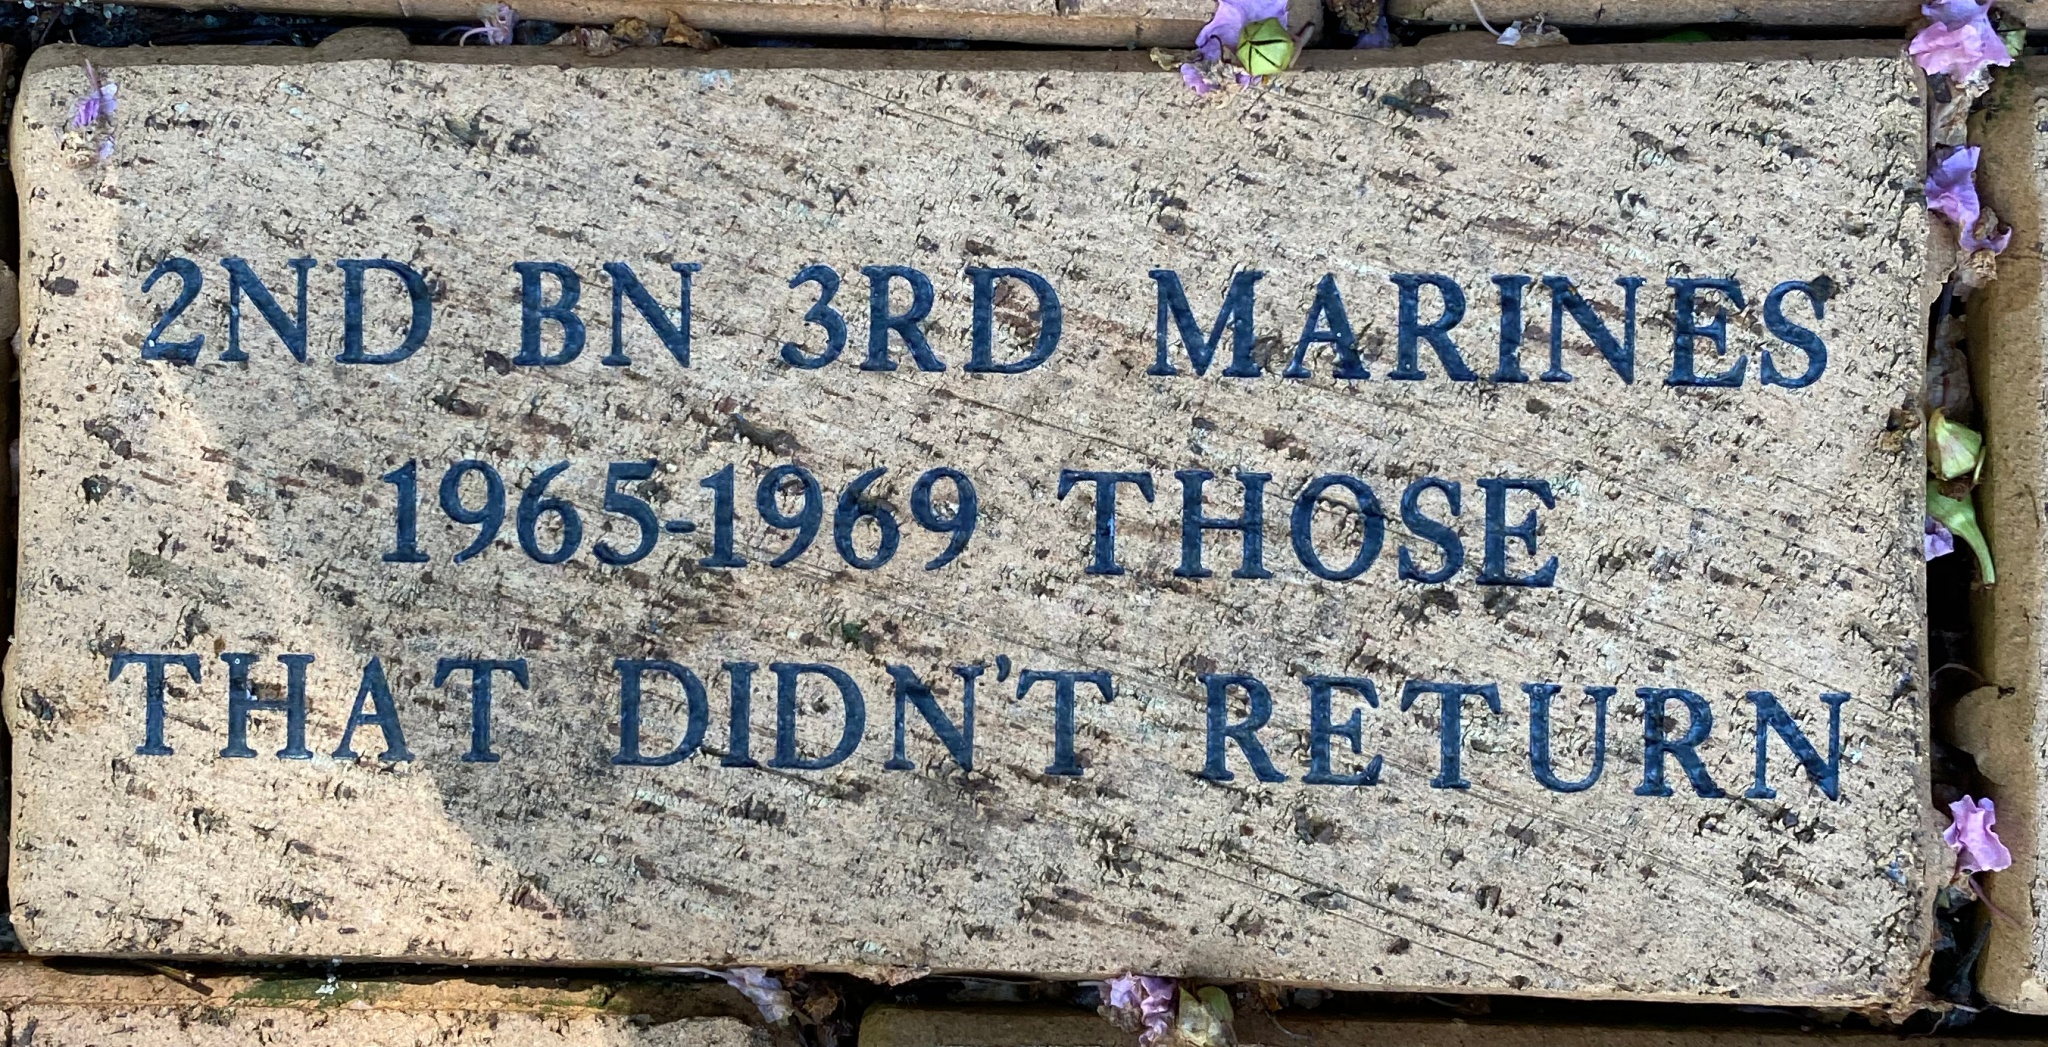 2ND BN 3RD MARINES 1965-1969 THOSE THAT DIDN'T RETURN